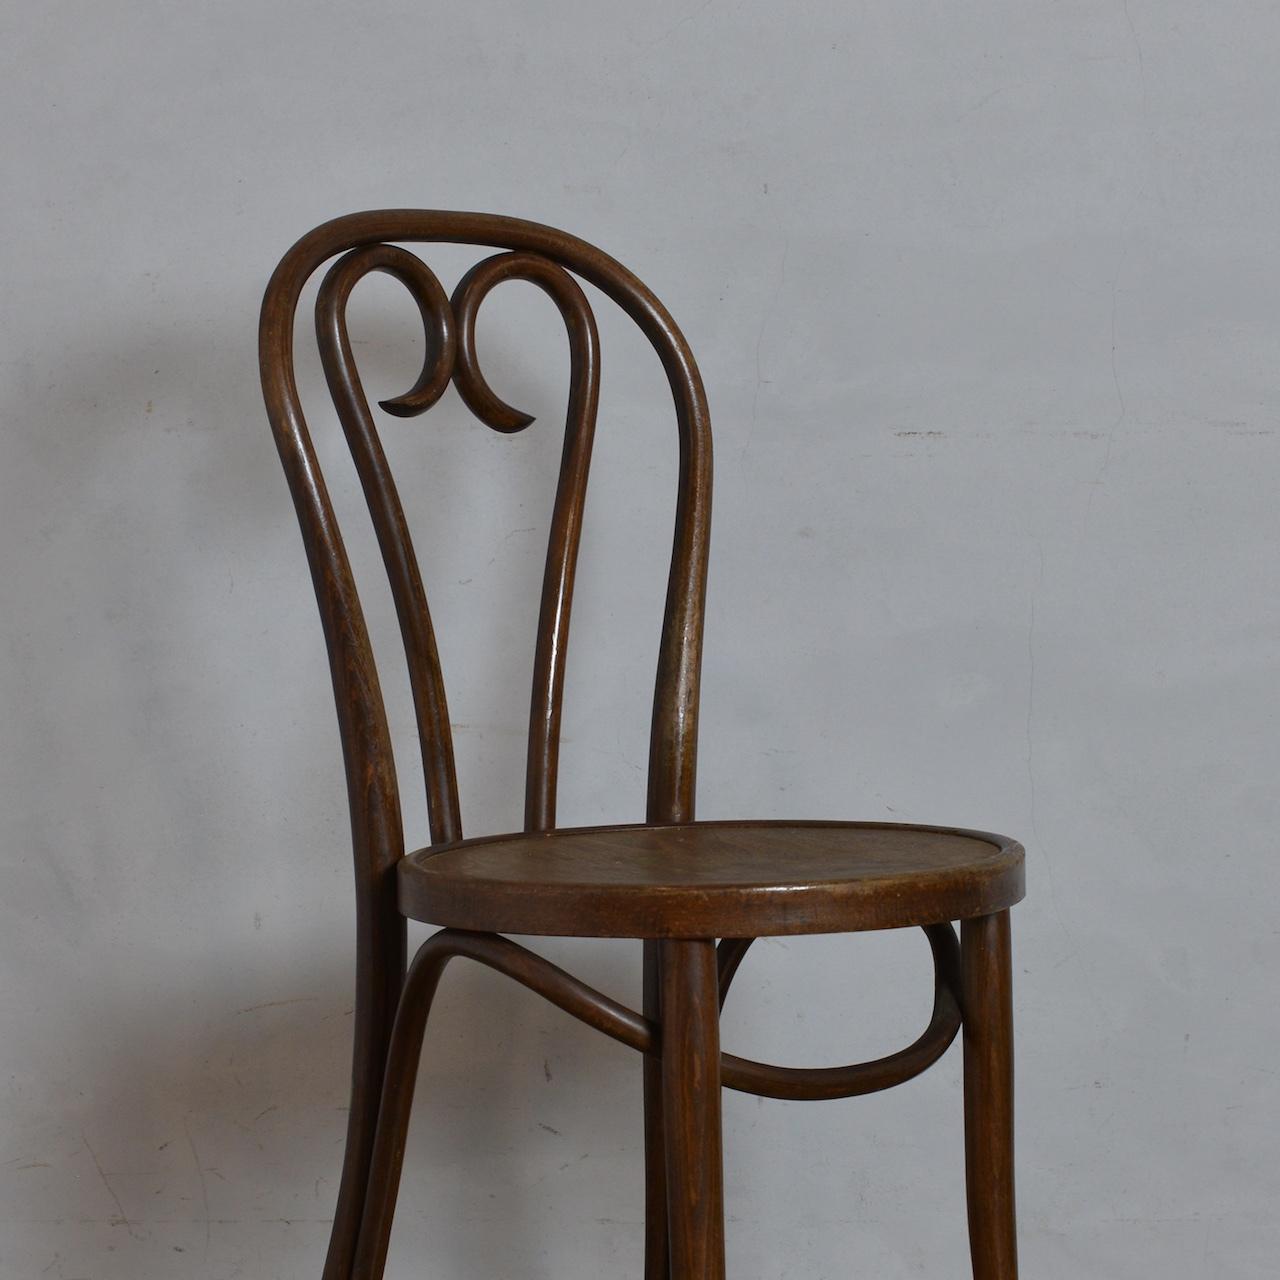 Bentwood Chair / ベントウッド チェア 〈ハートバック・ダイニングチェア〉